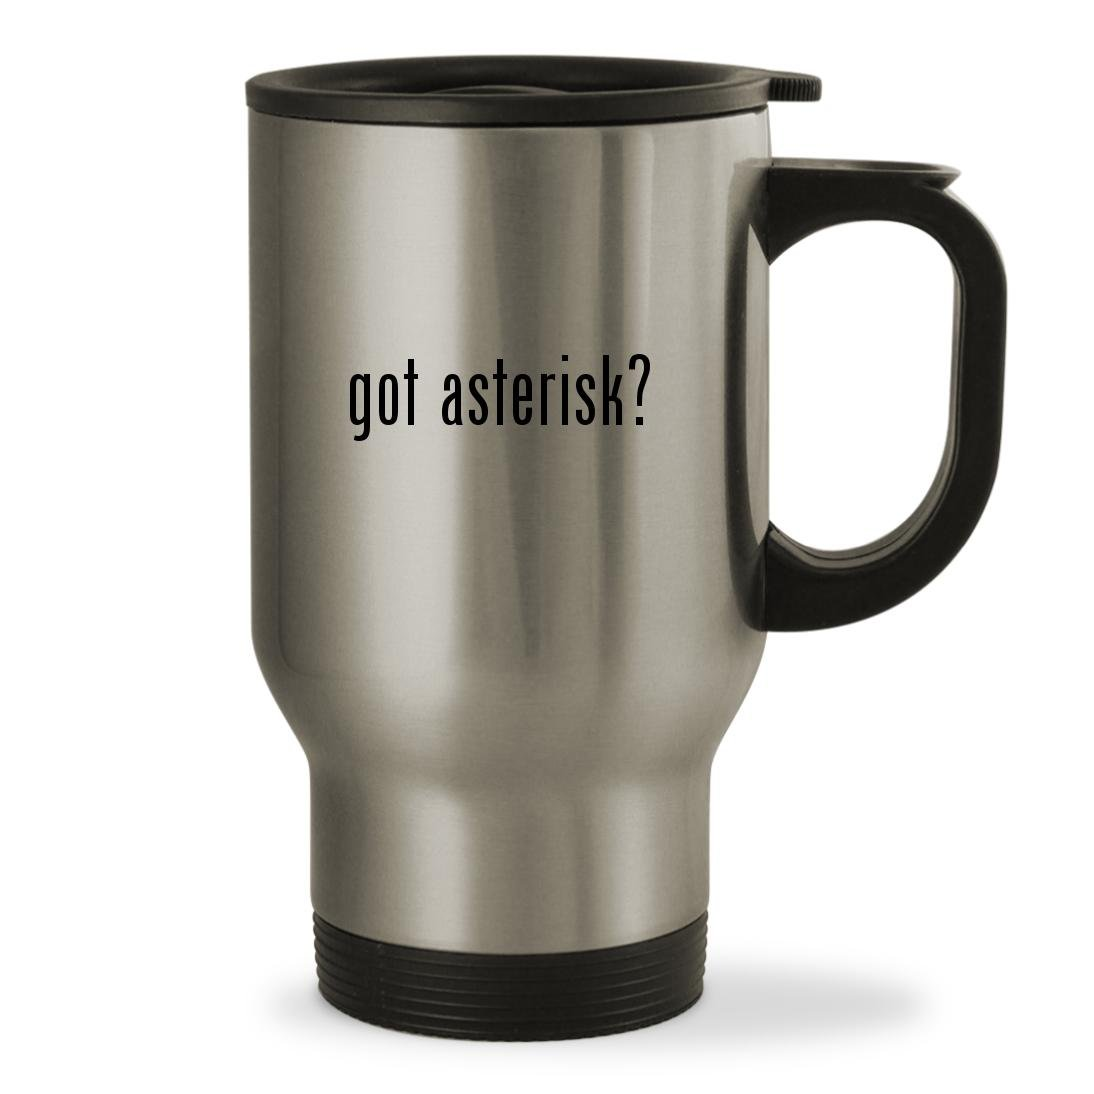 got asterisk? - 14oz Sturdy Stainless Steel Travel Mug, Silver